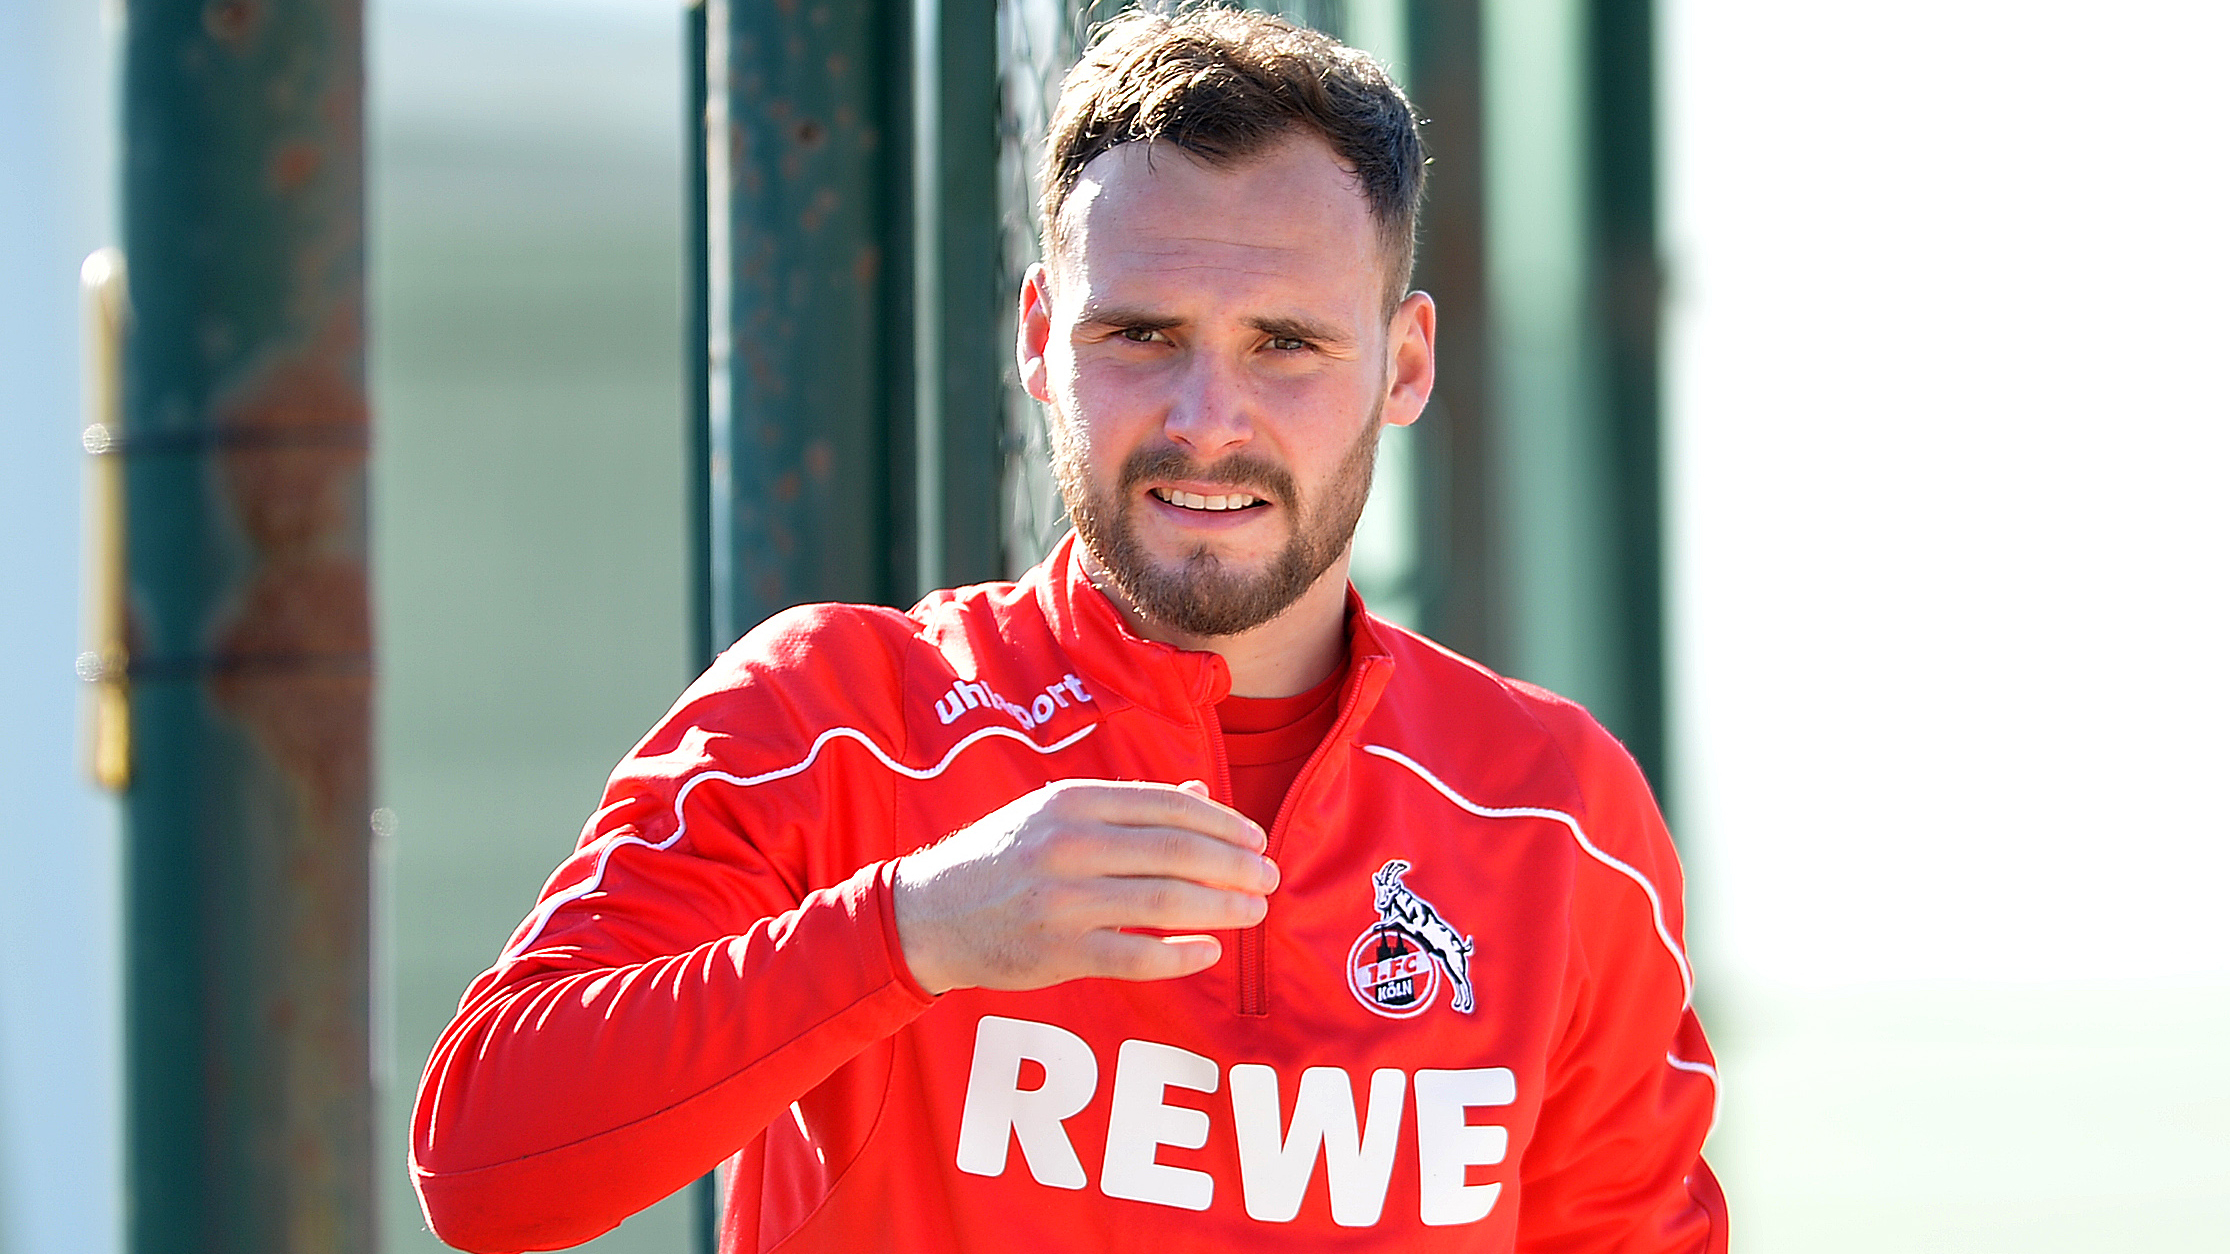 Koln midfielder Verstraete: It's 'bizarre' we are still training after three positive Covid-19 tests